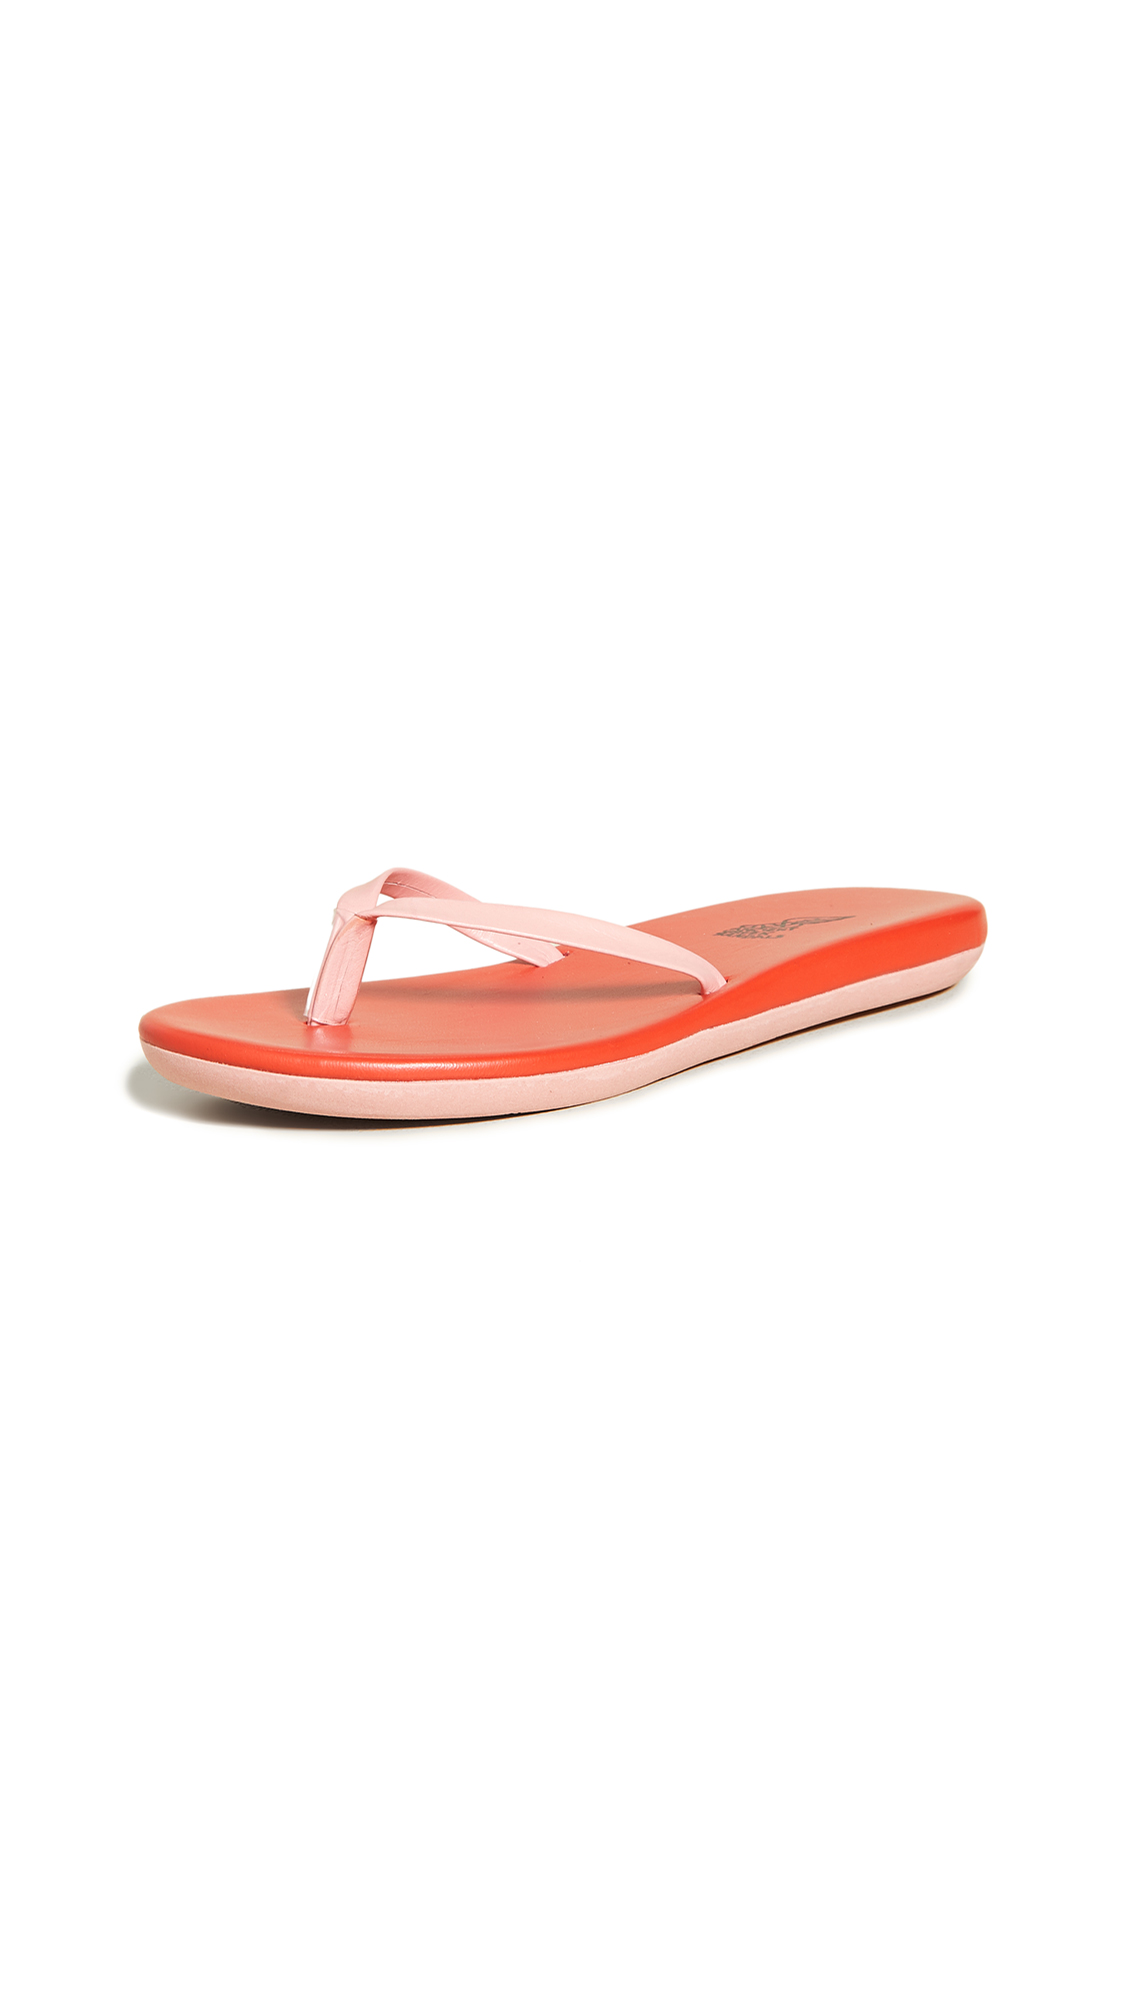 Ancient Greek Sandals Sagionara Flip Flops - Pink/Red